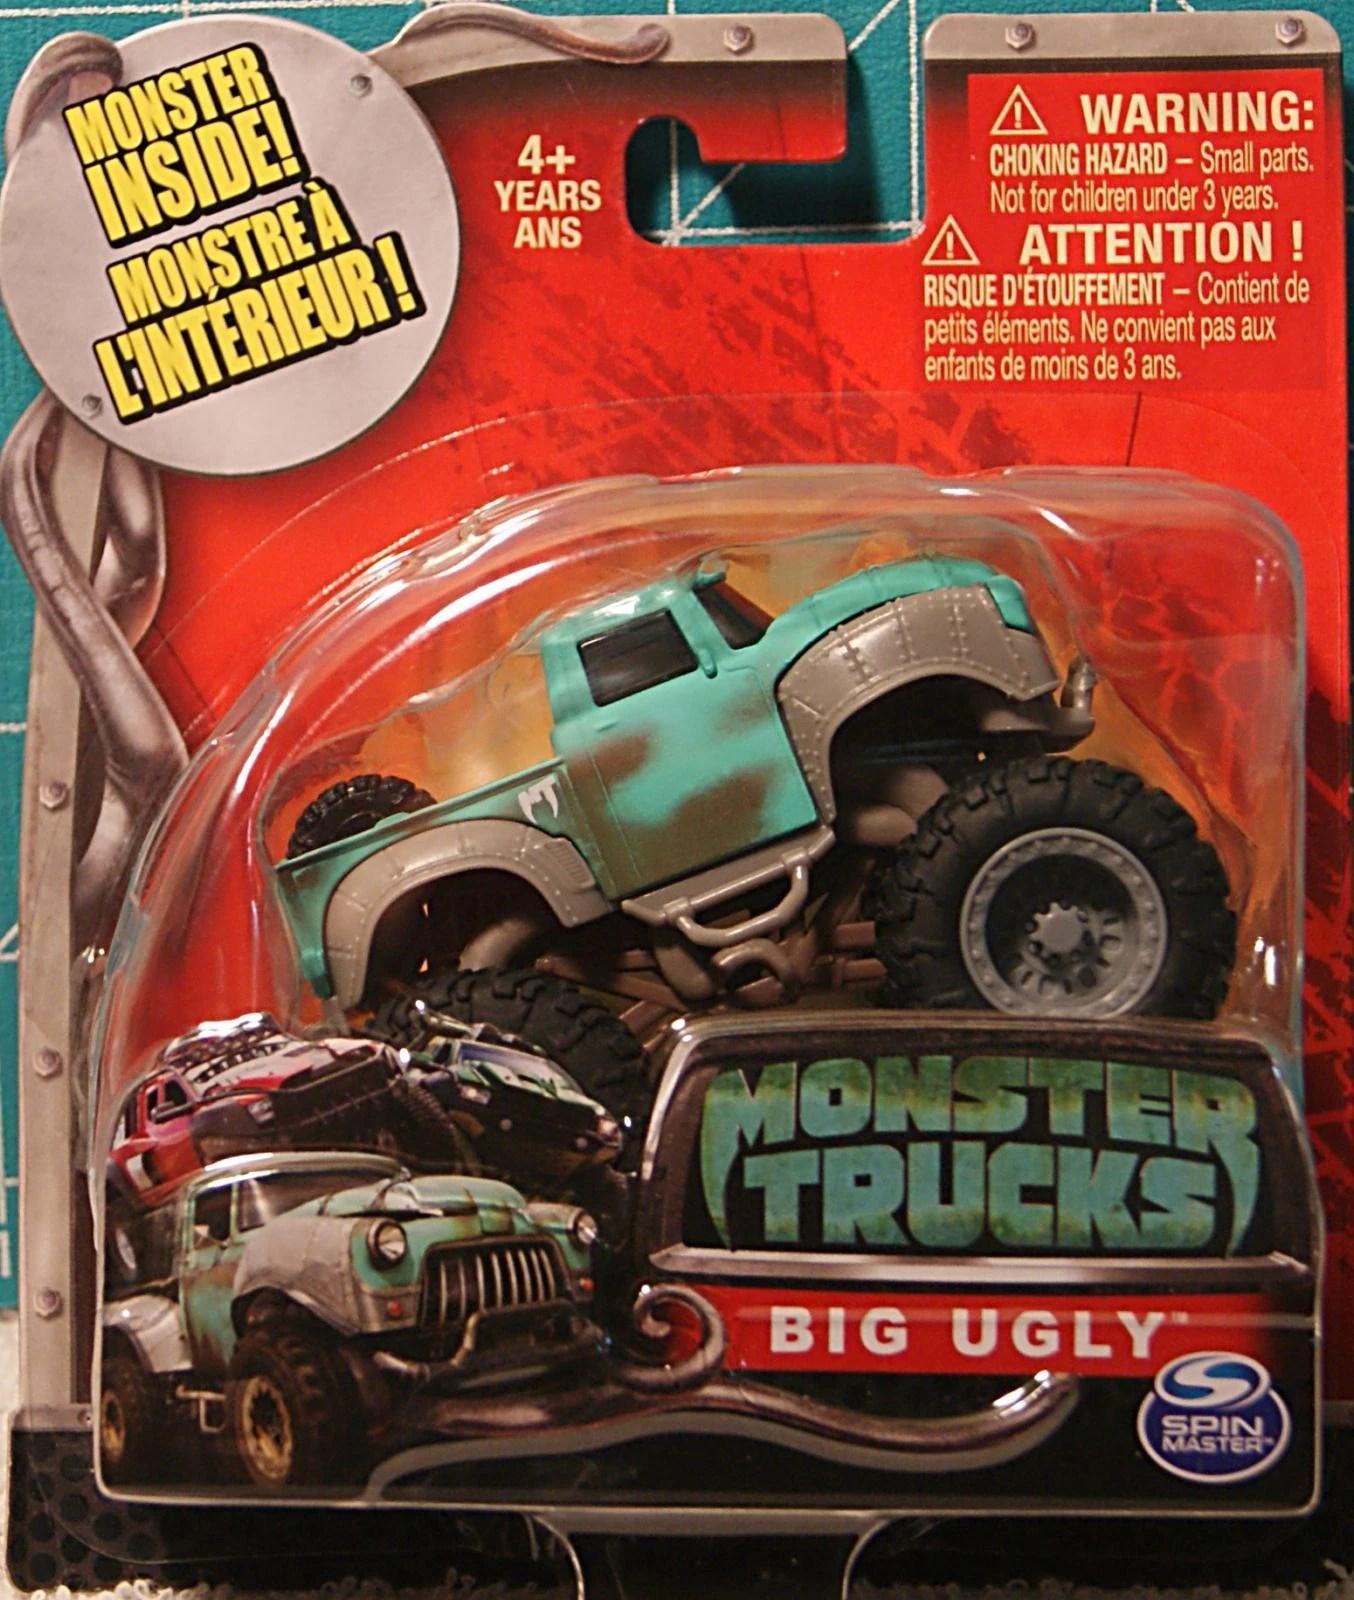 الازدهار مكان ما شرائح لحم monster trucks movie toys